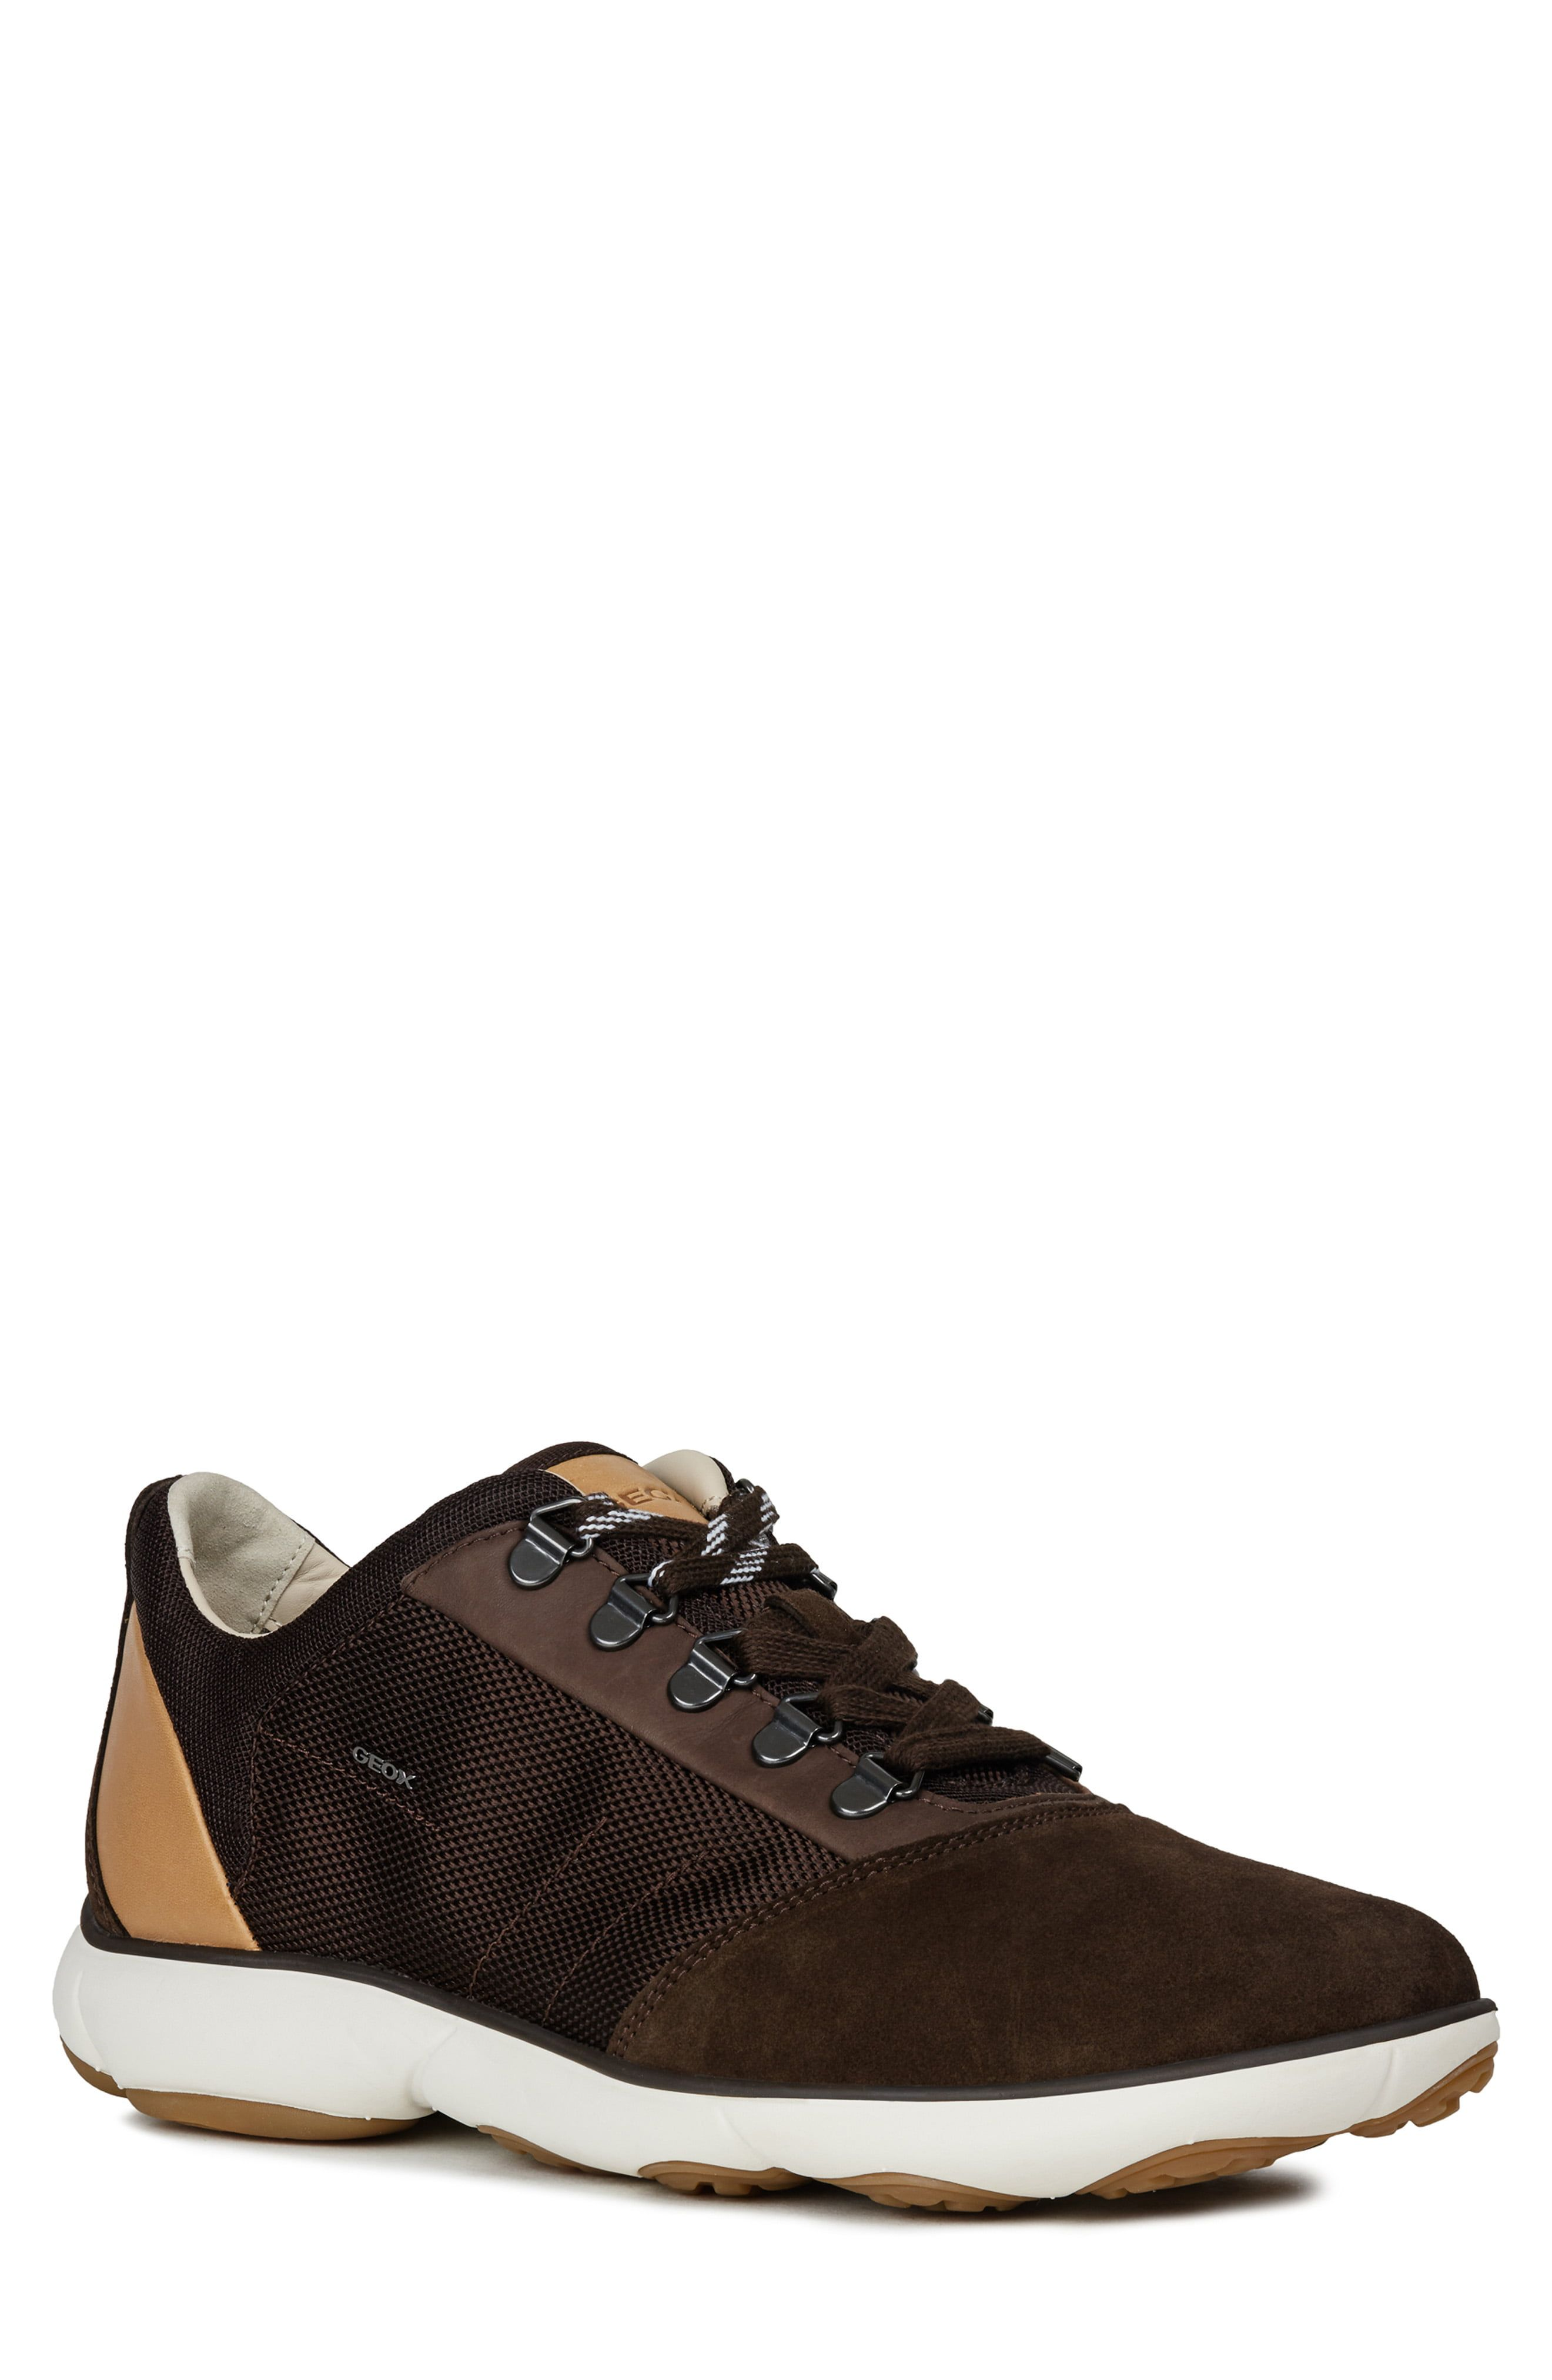 Geox Nebula 56 Sneaker | Products in 2019 | Sneakers, Brown